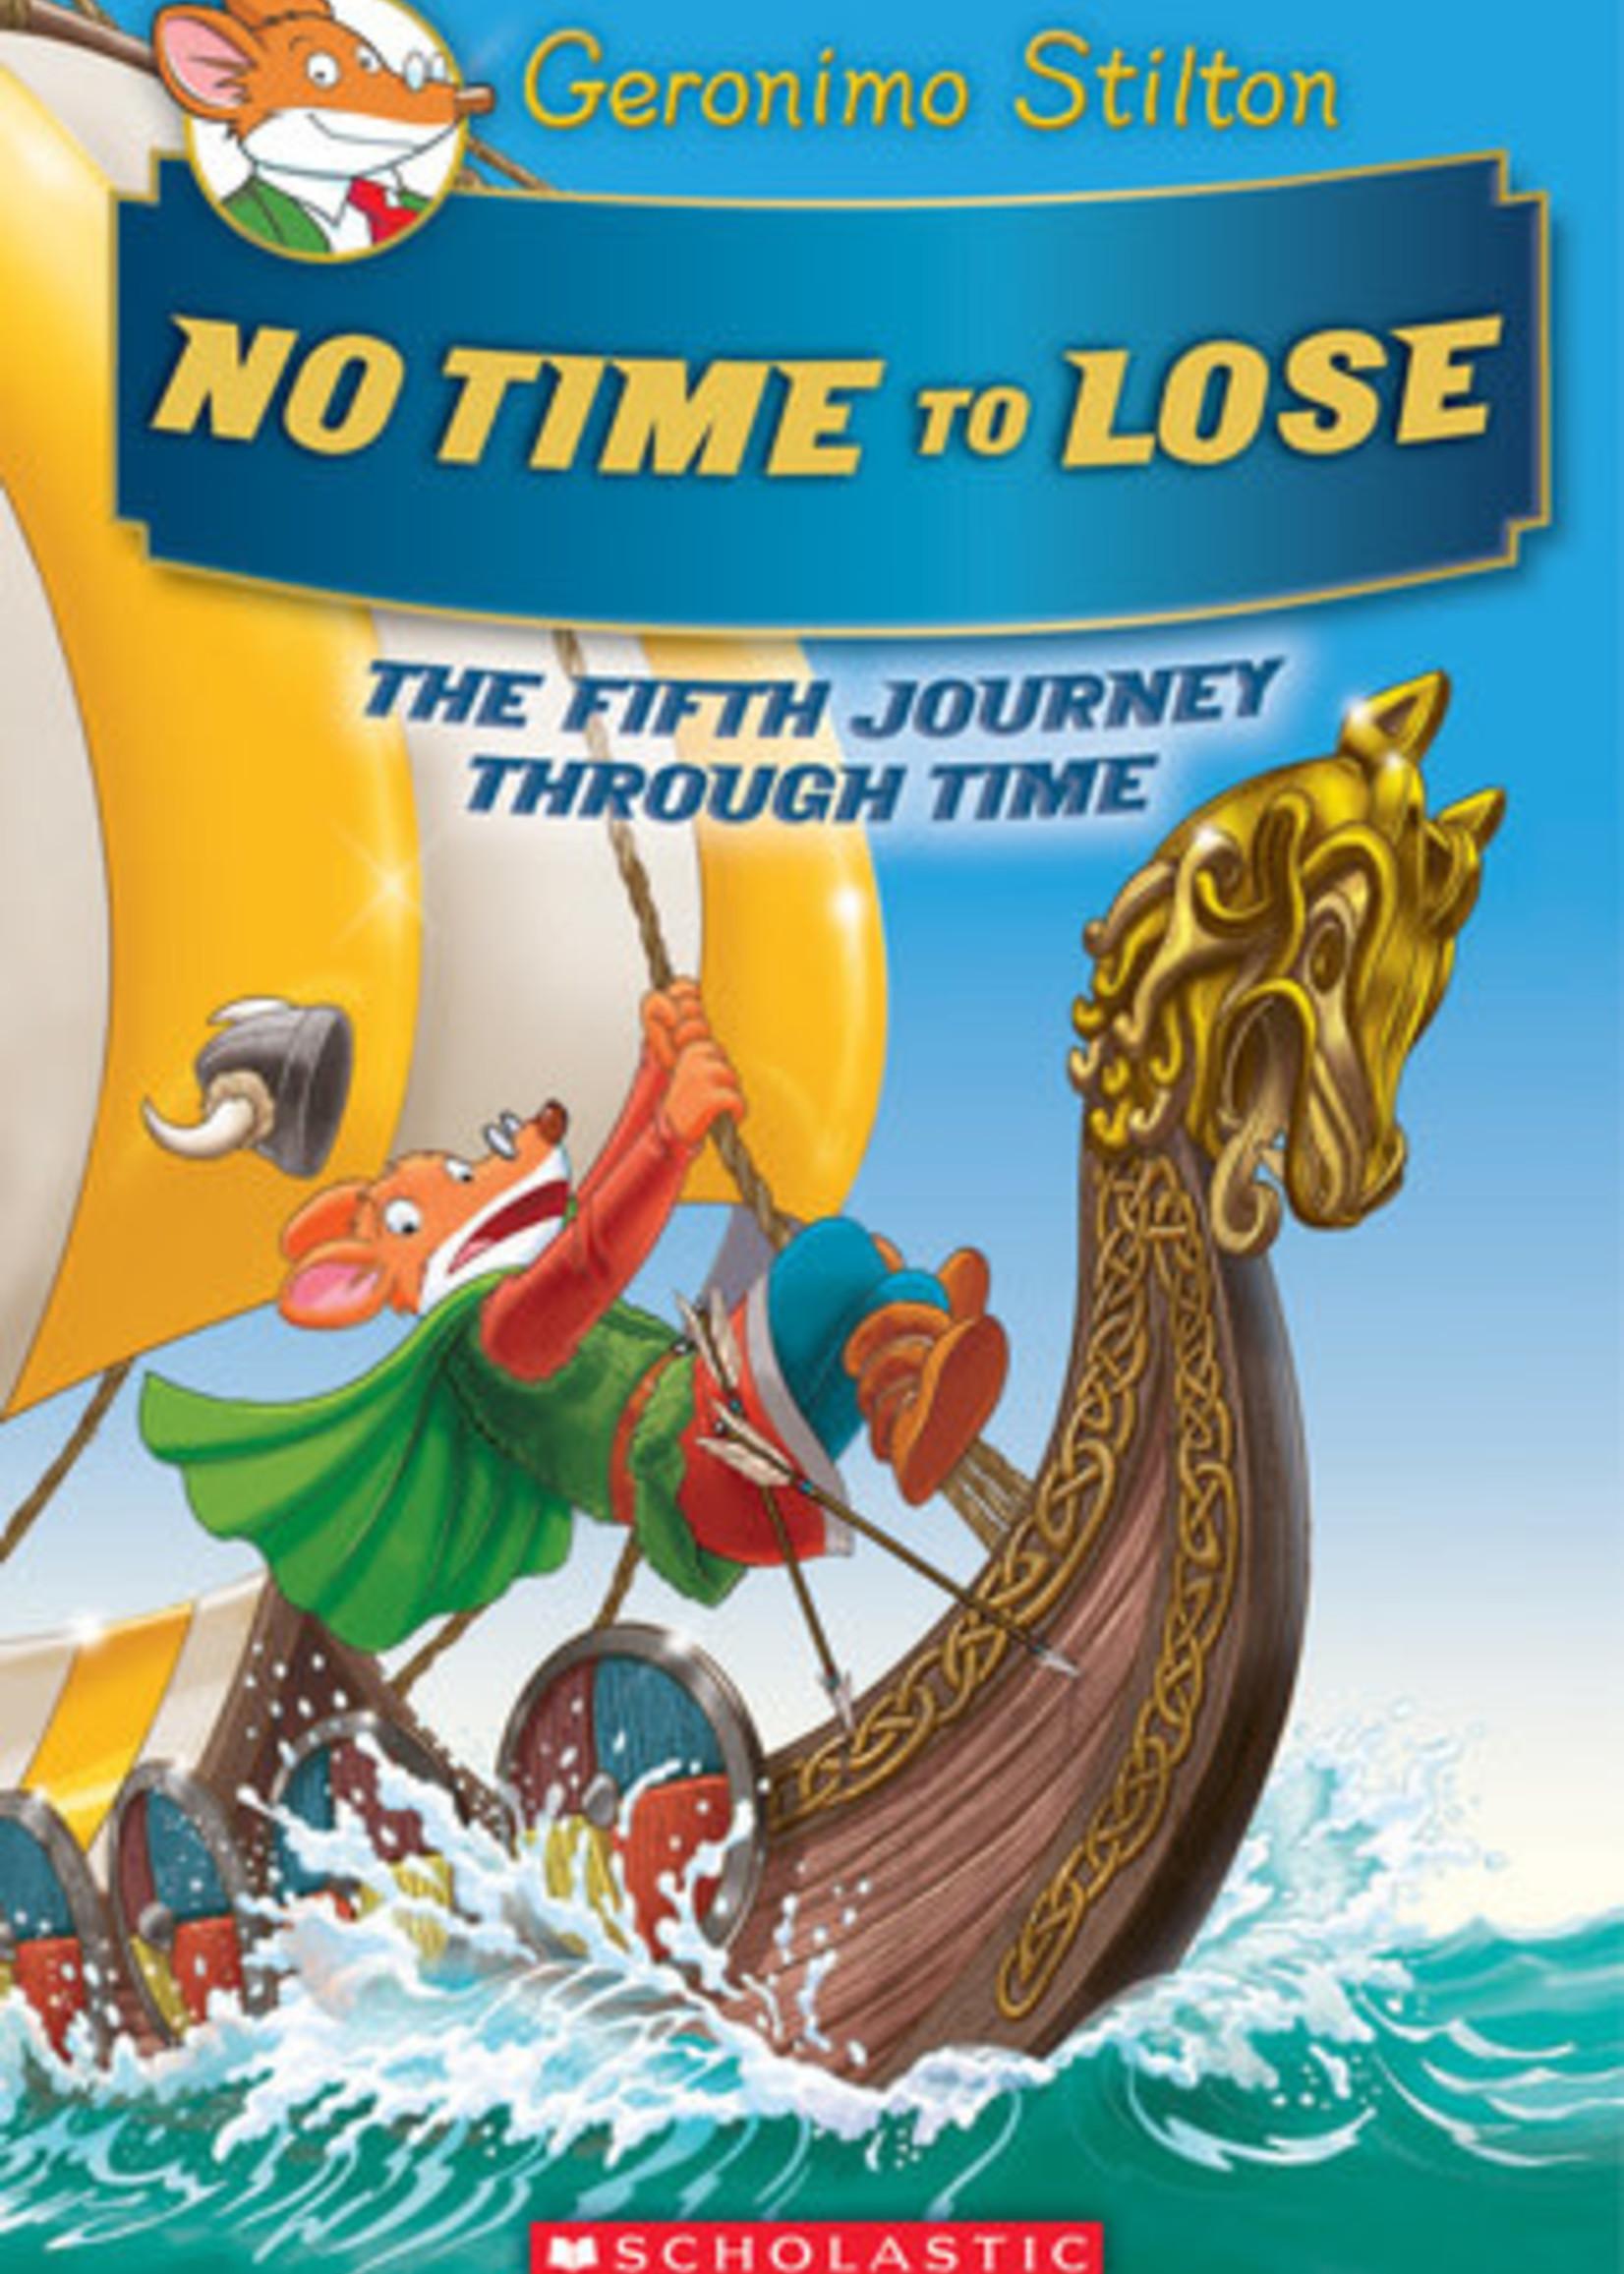 No Time To Lose (Journey Through Time #5) by Geronimo Stilton